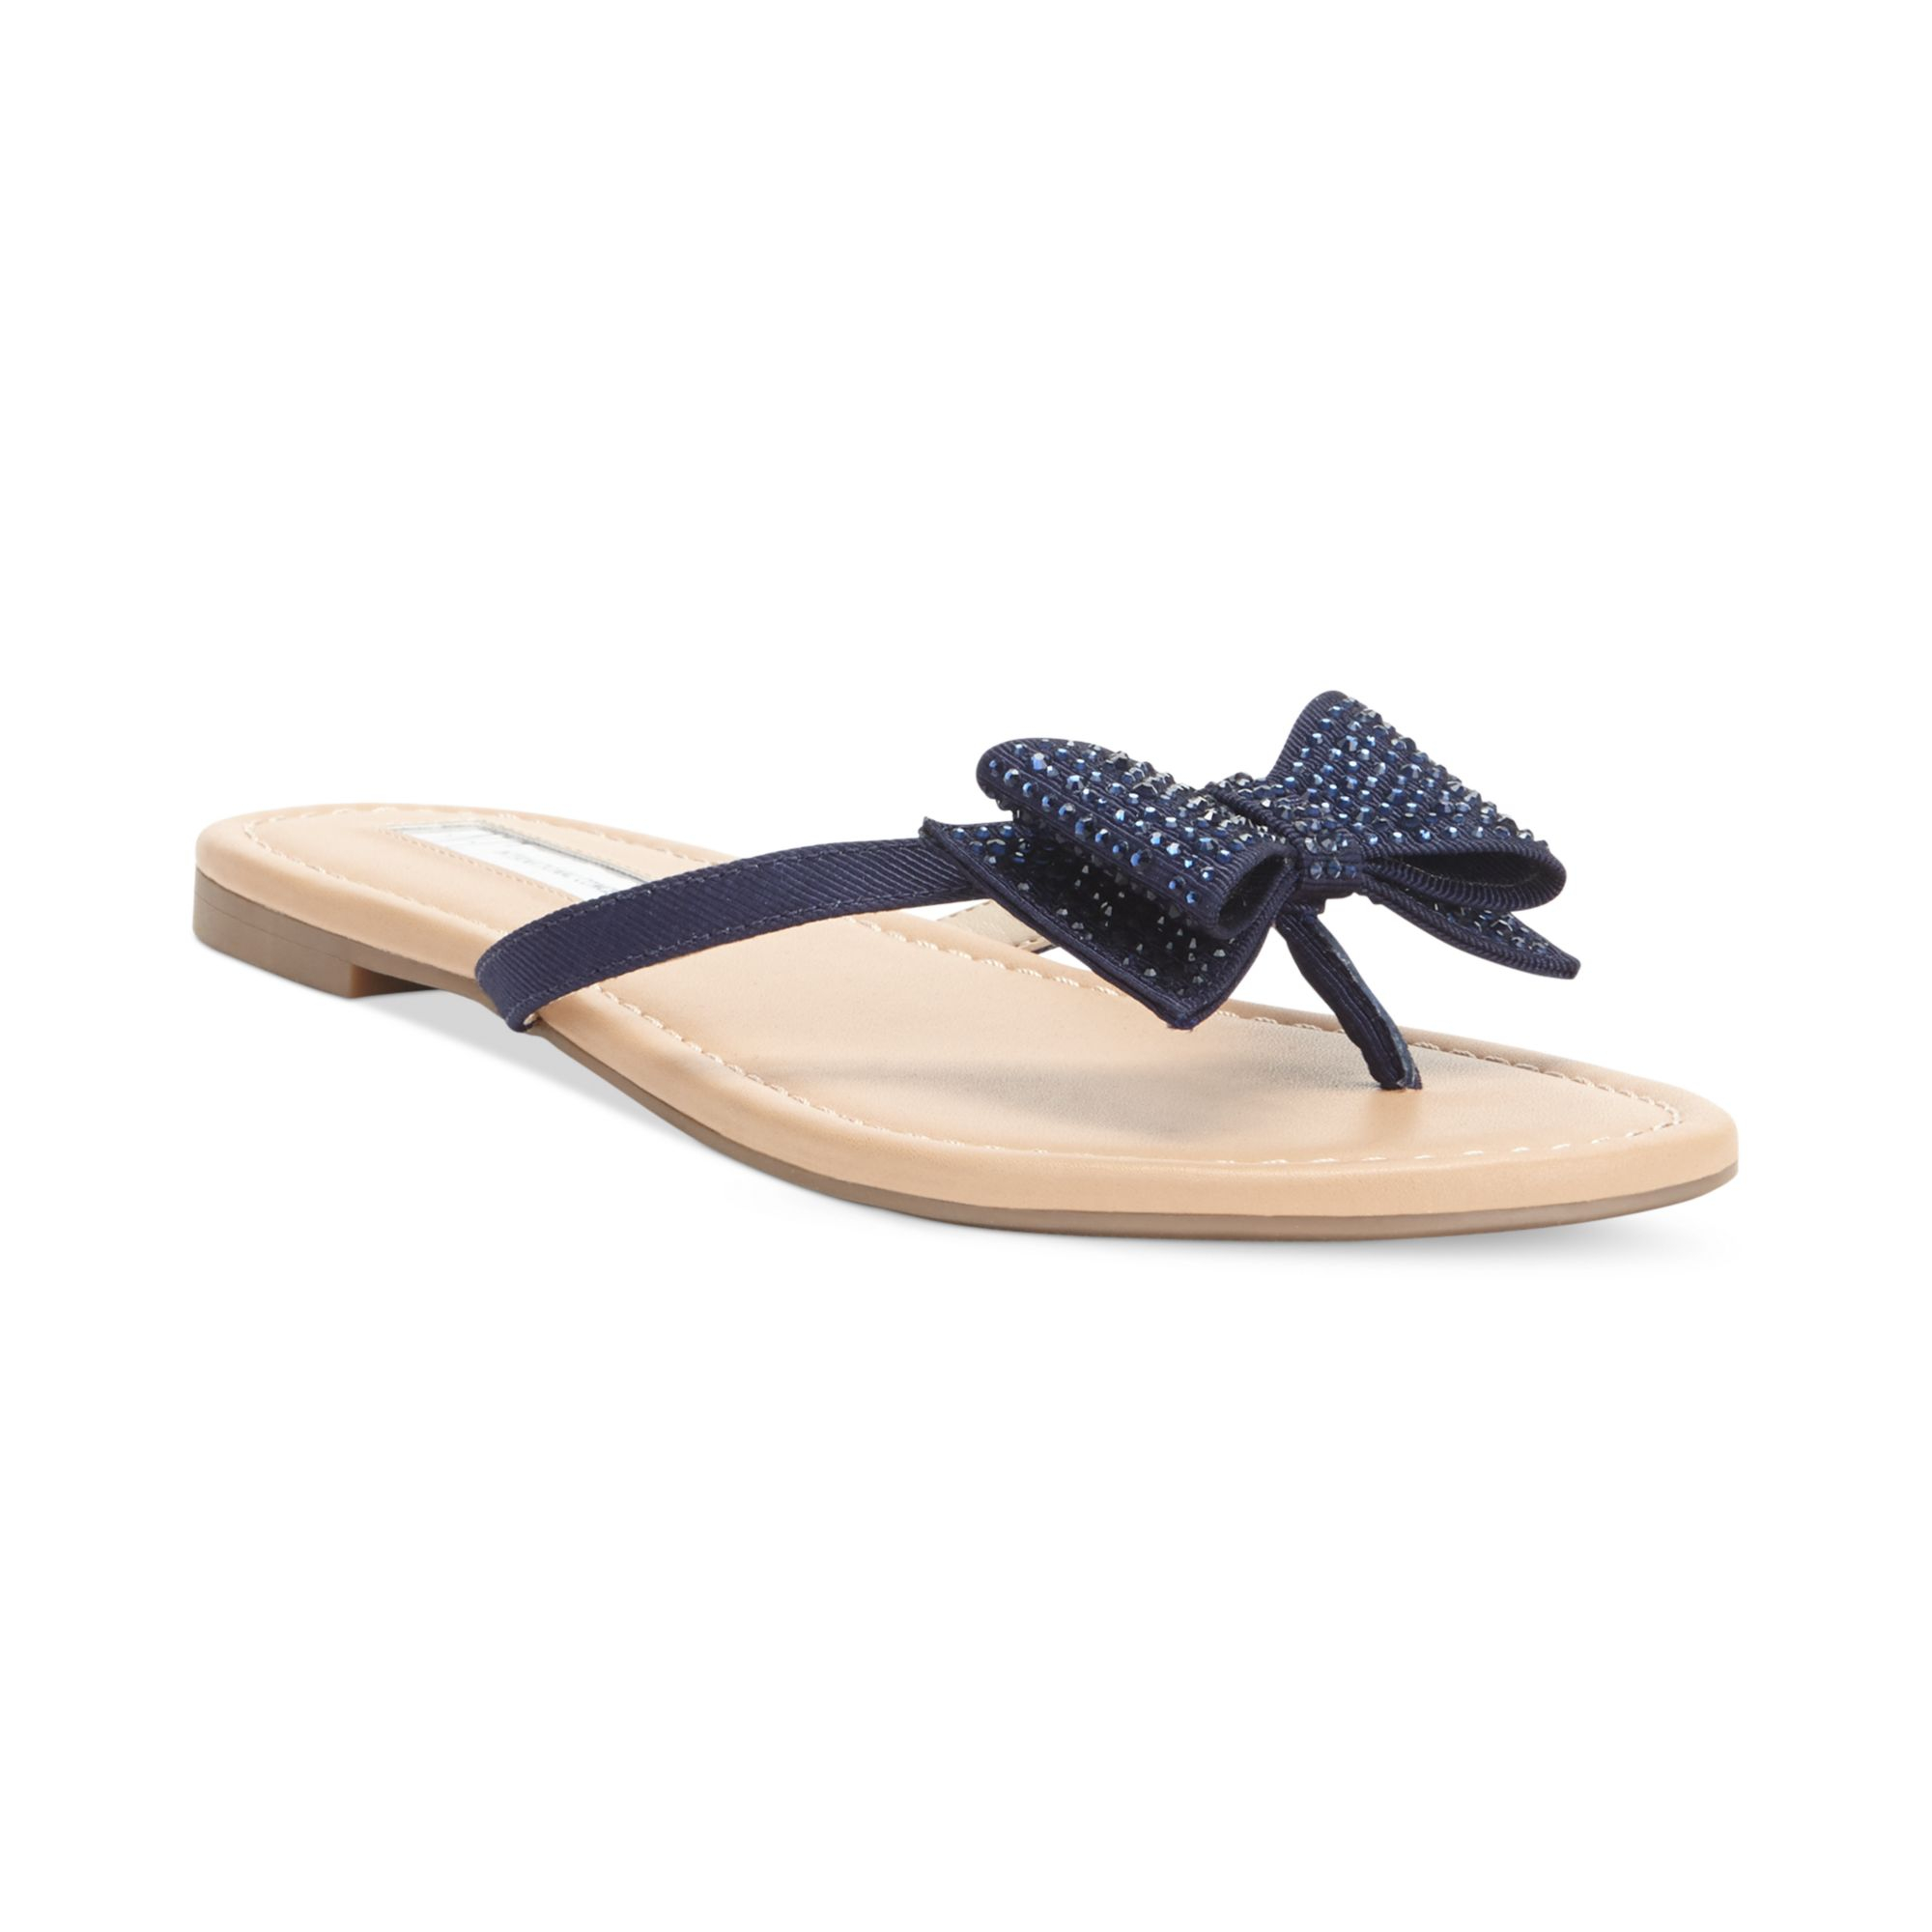 0db220a078eca Lyst - INC International Concepts Womens Maey Bow Thong Sandals in Blue